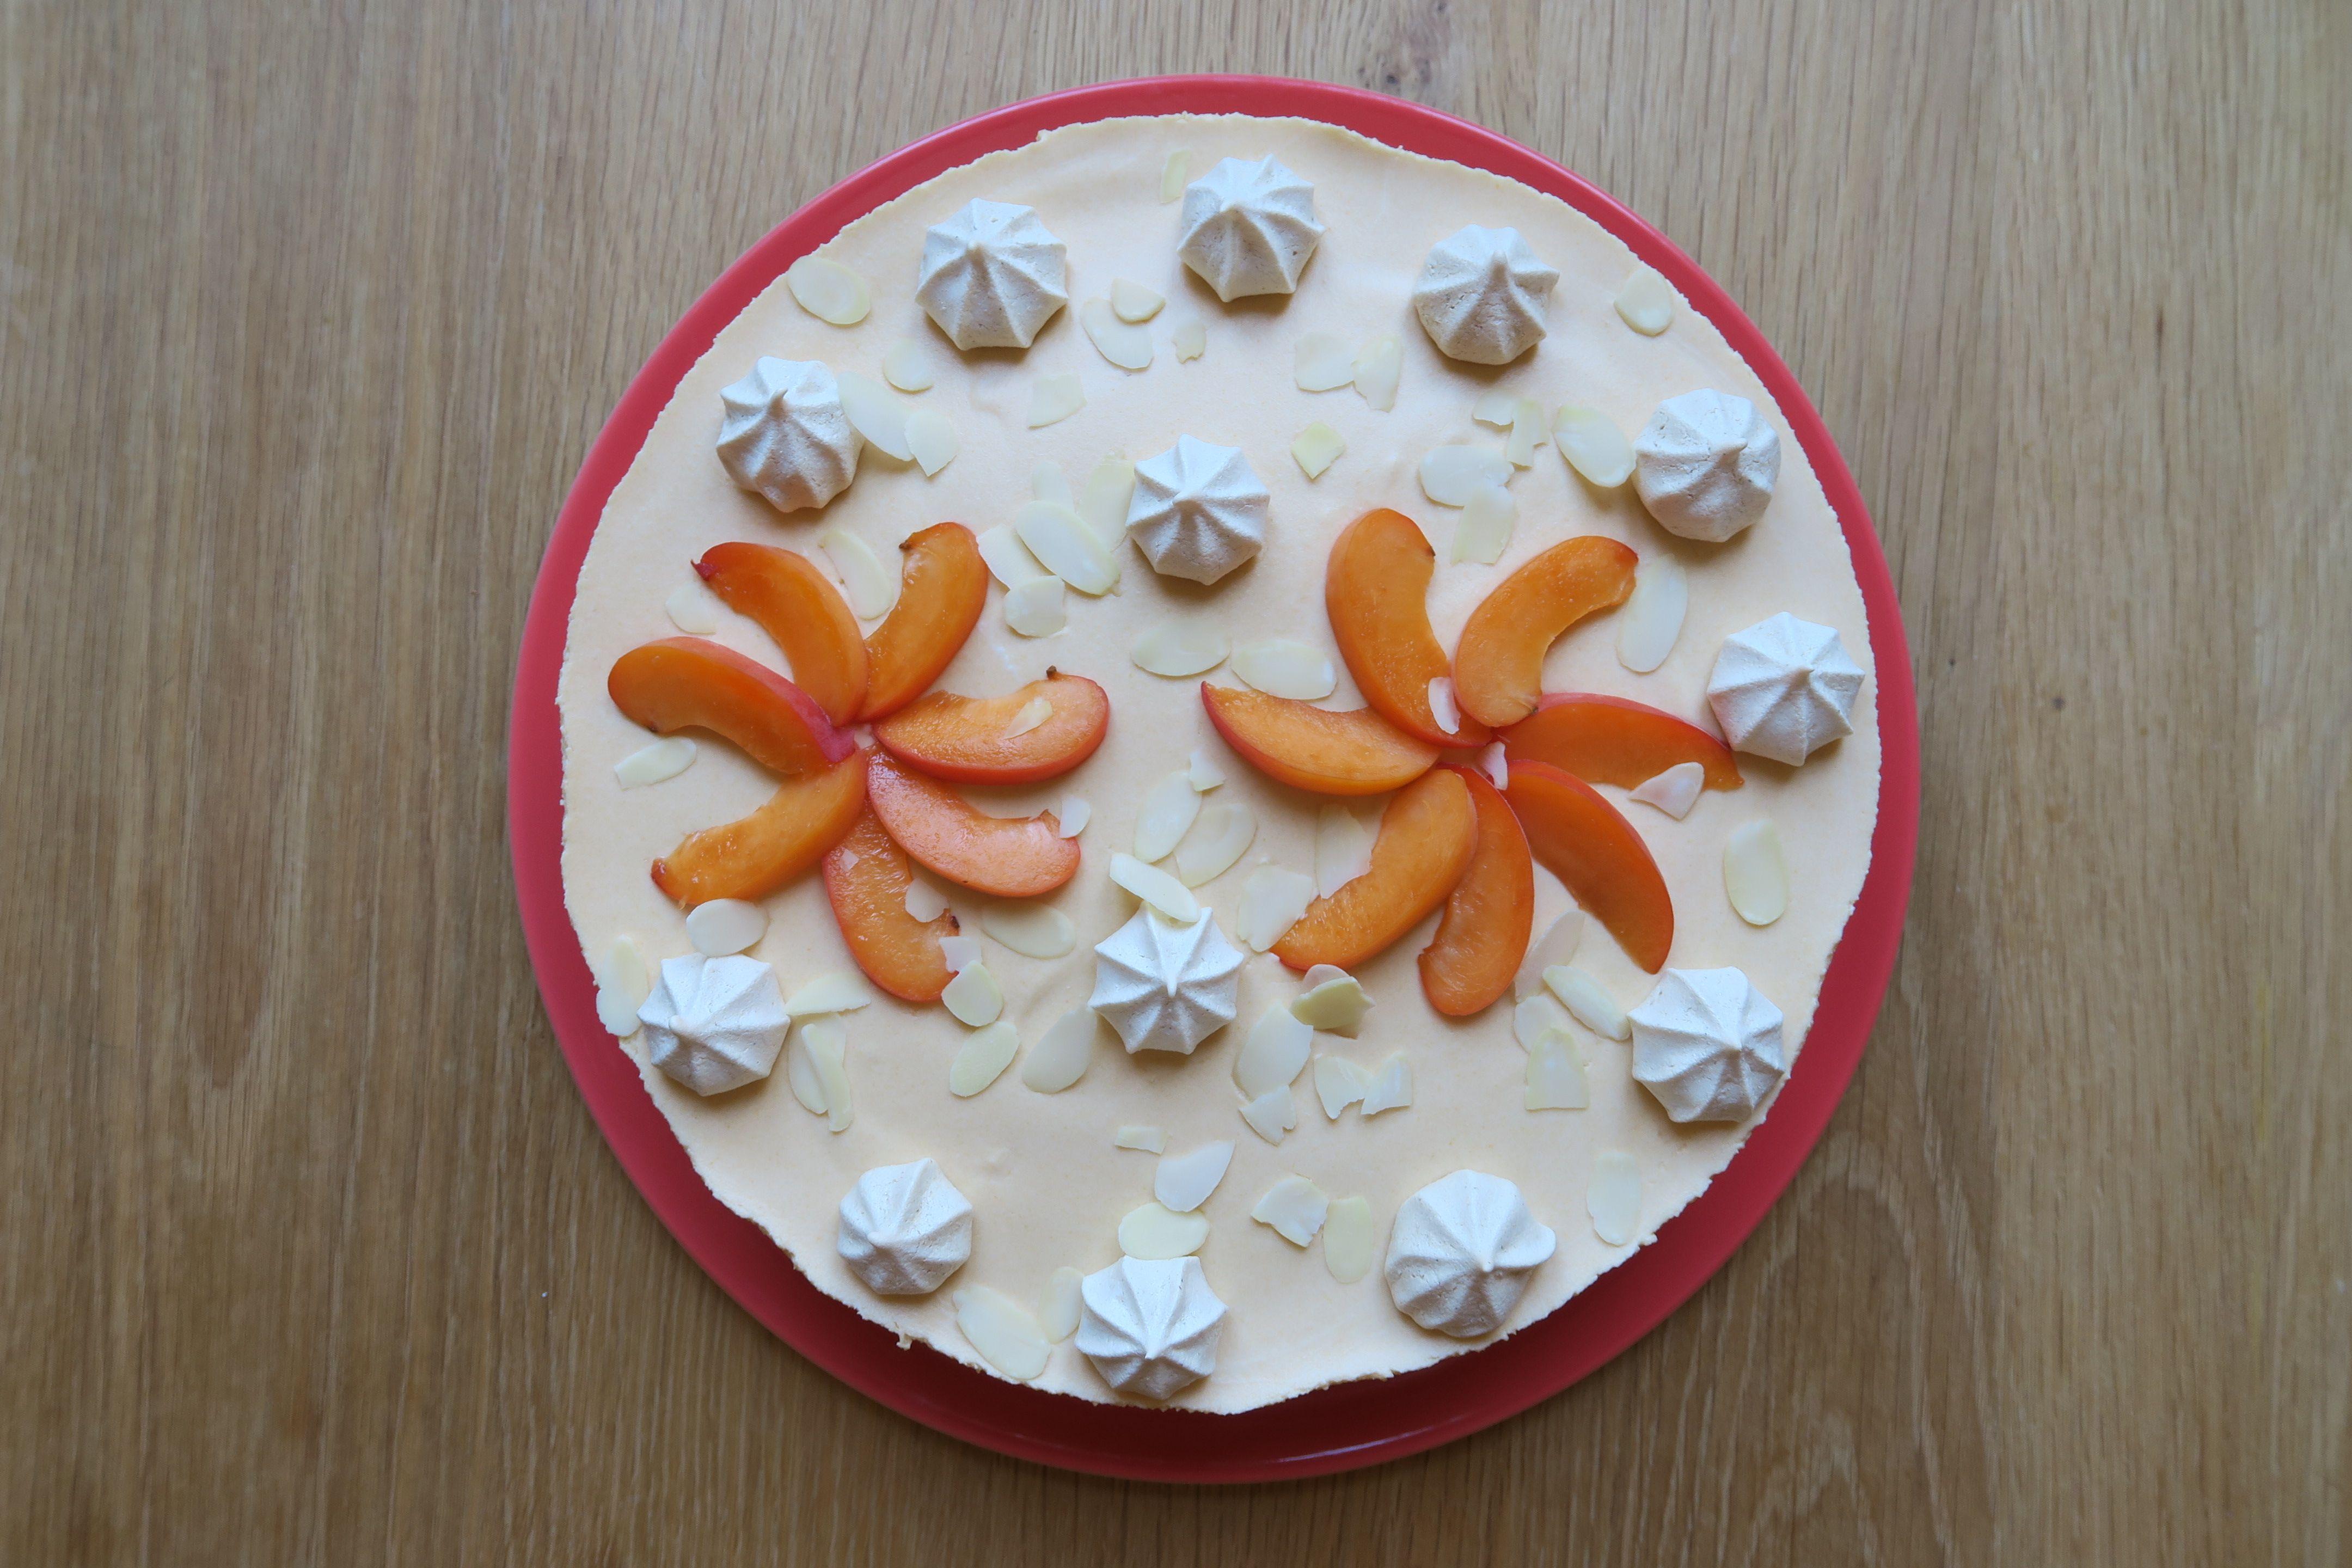 Pinky Cake, Entremets Abricot, Amande et Meringue  #entremets #abricots #amande #meringue #meringuefrançaise #entremetsabricots #dacquoise #pinkycake